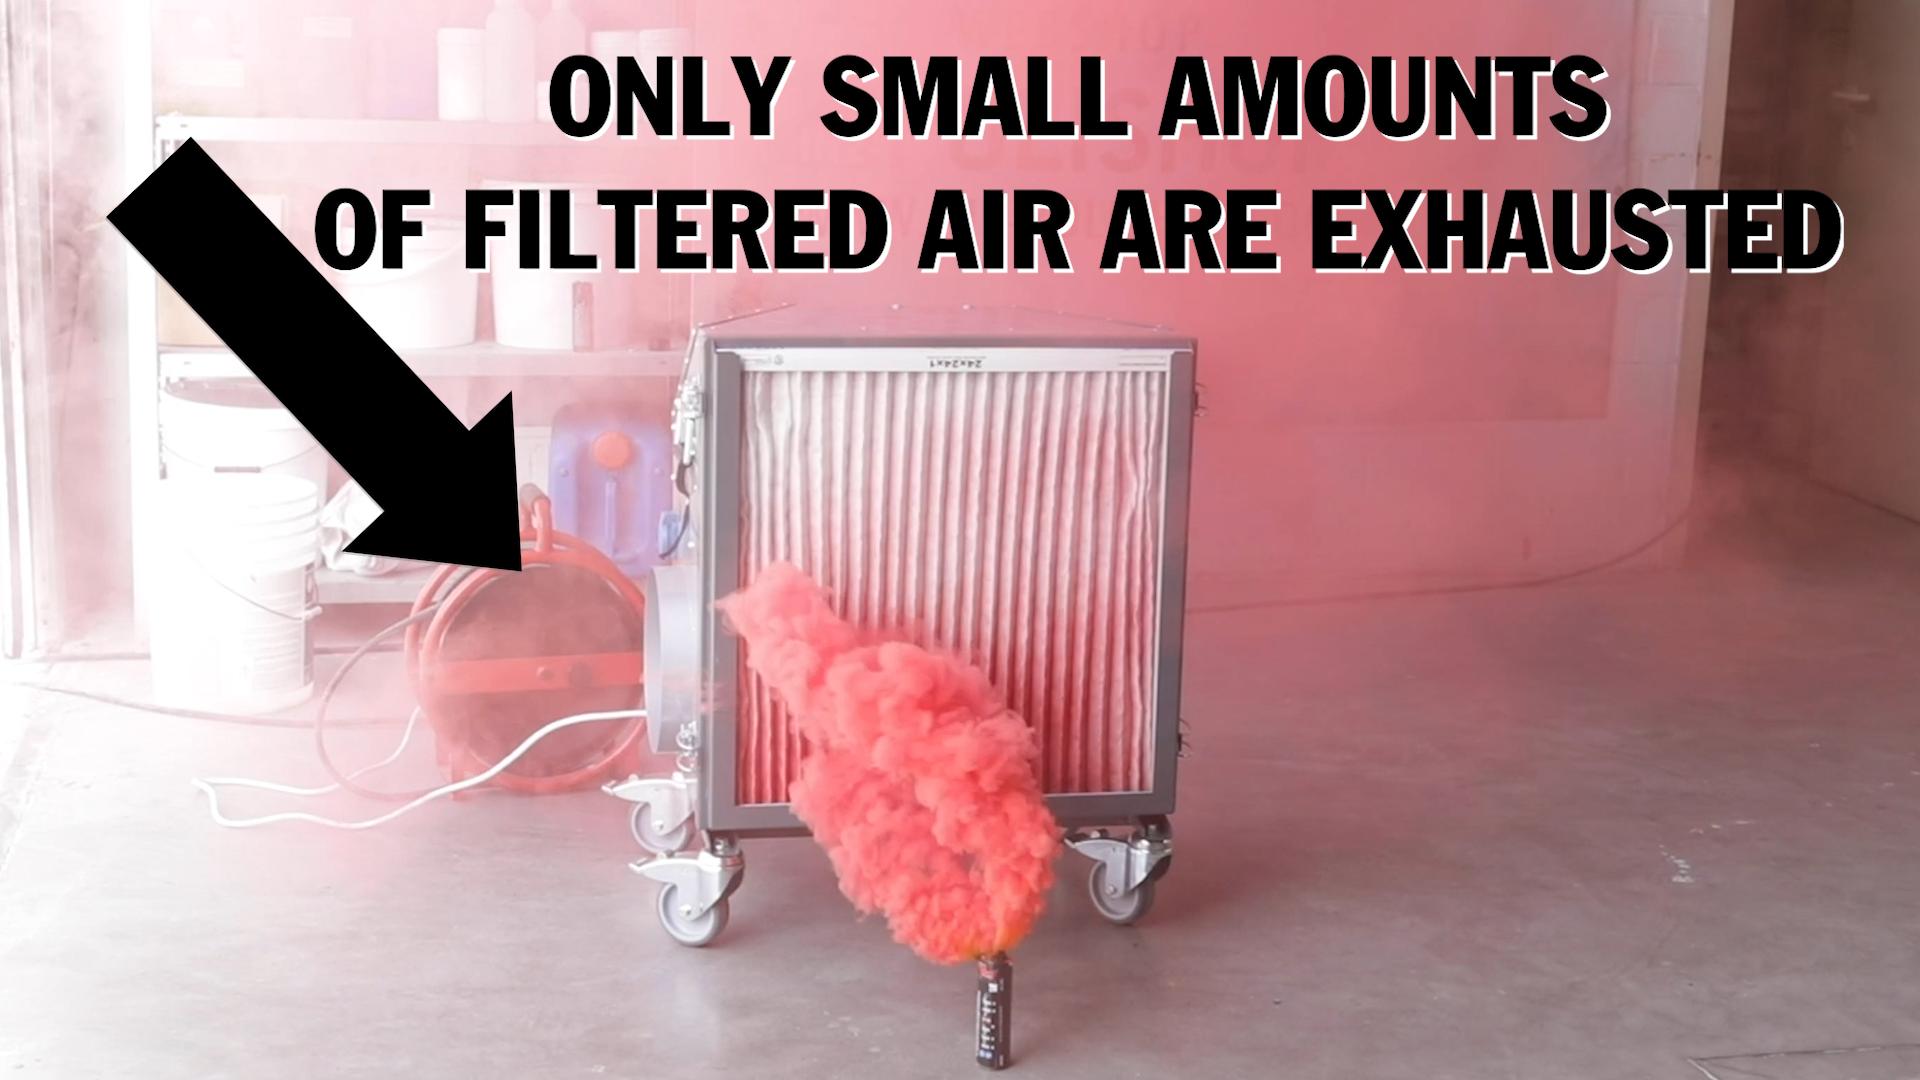 Lavina Air Scrubber vs. Rookbom